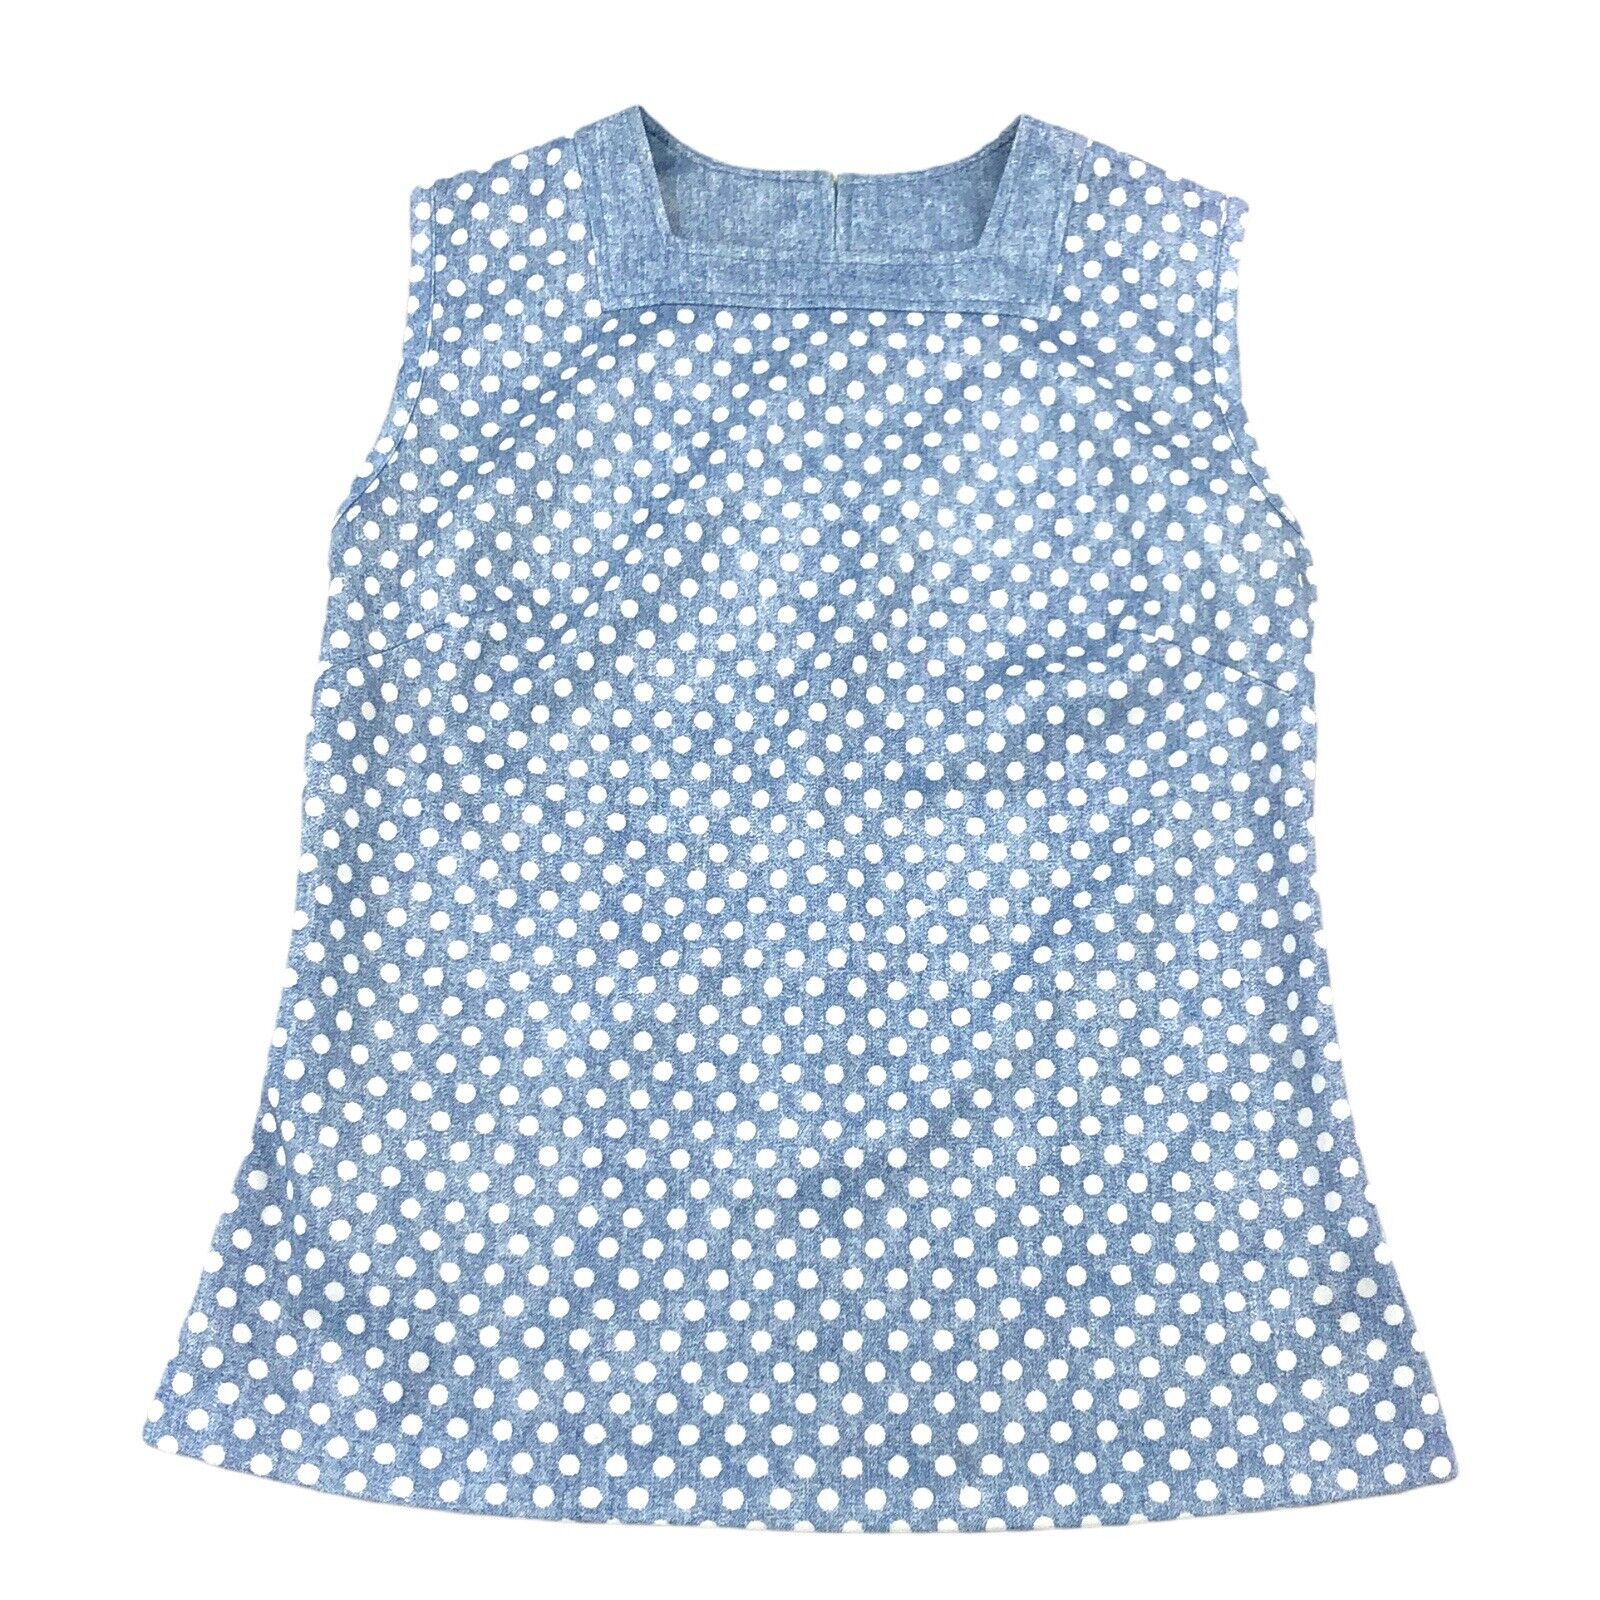 Vintage 70s Sleeveless Polka Dot Top Square Neck Blue White Womens Size 14 / M